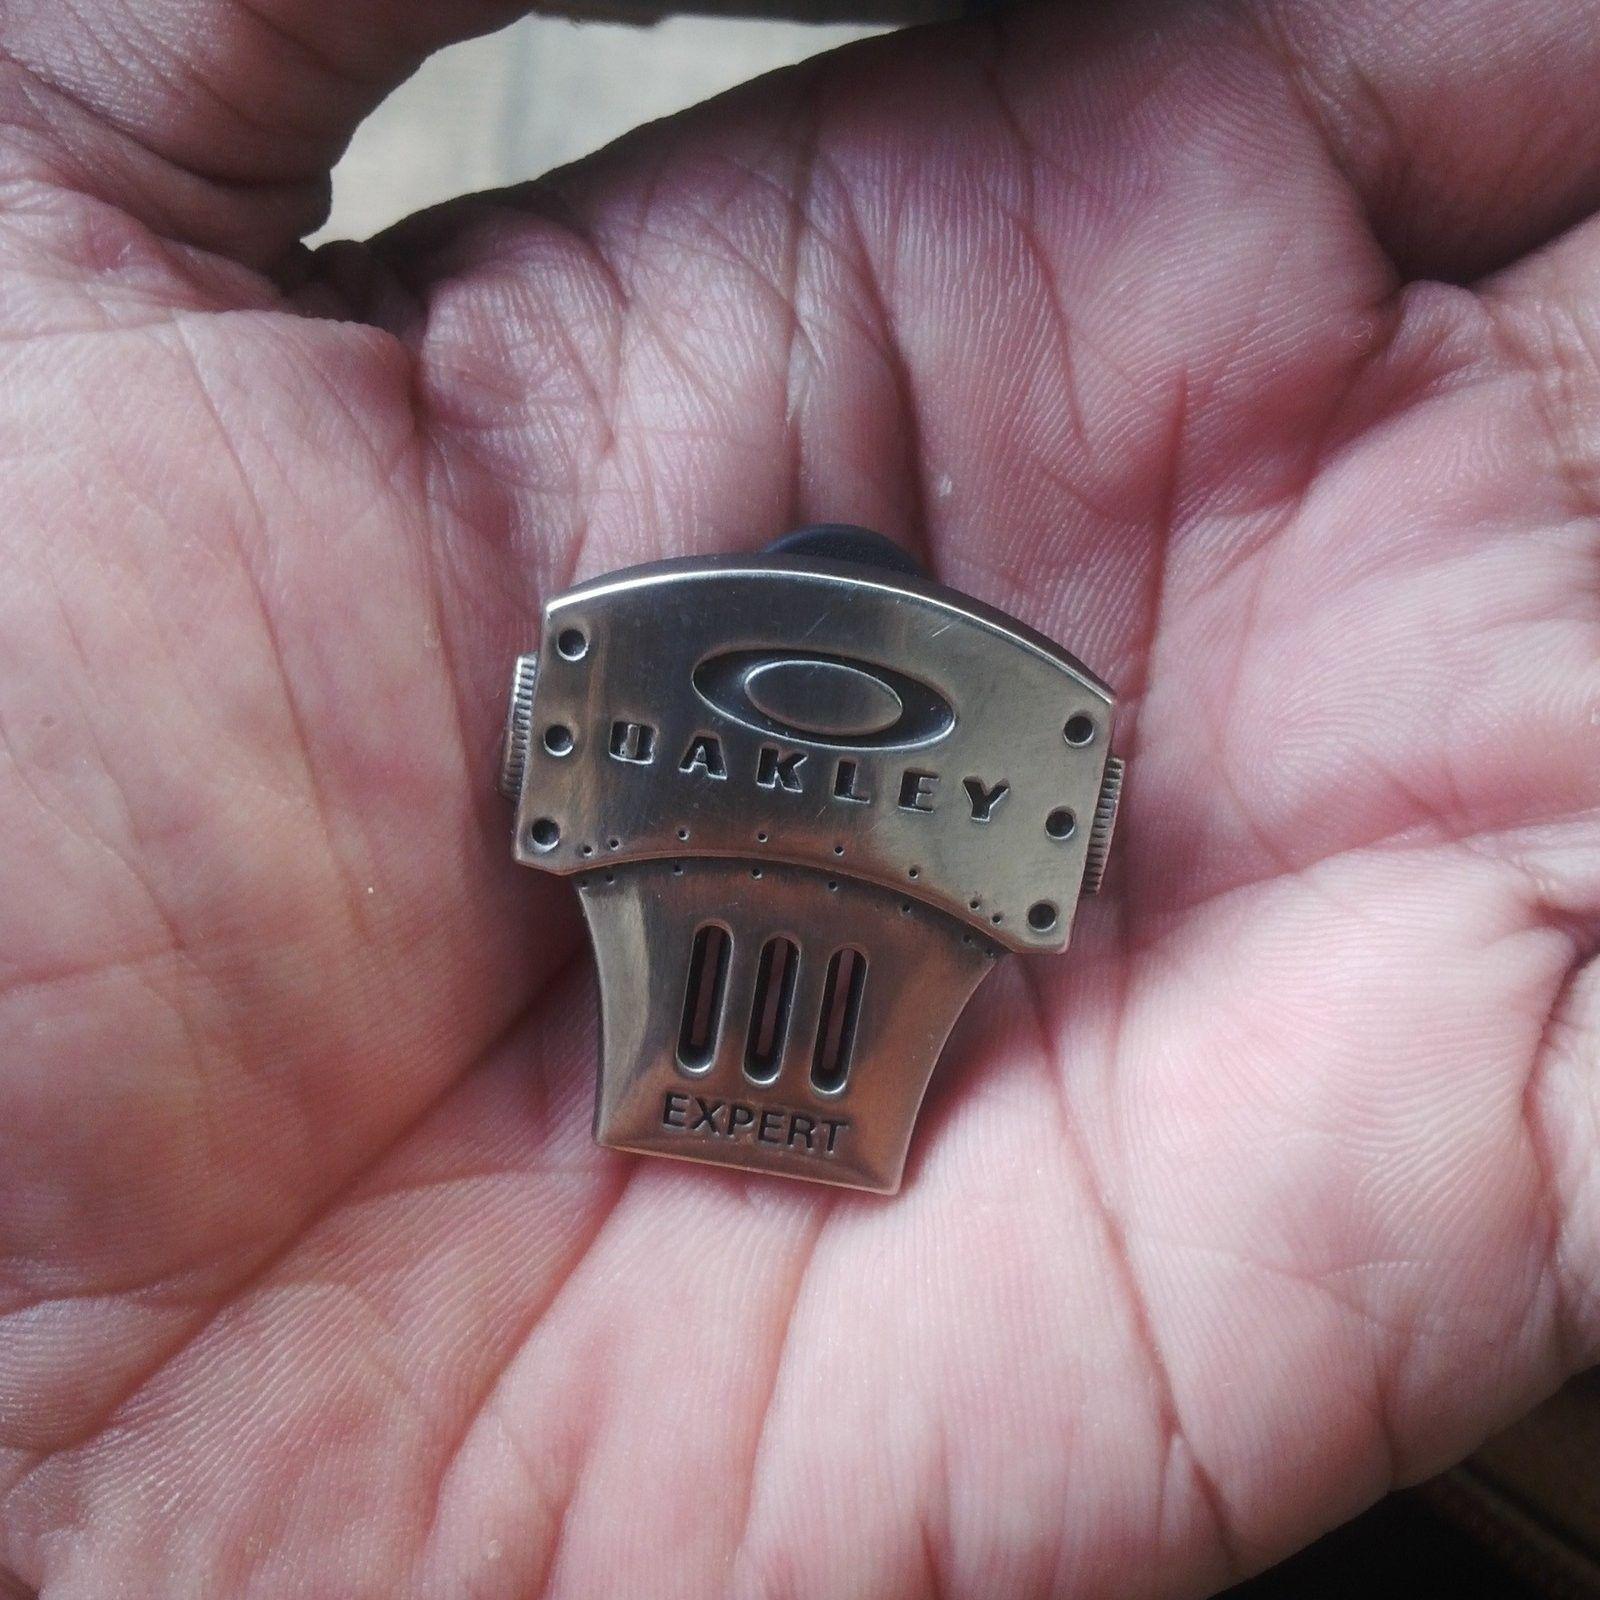 Oakley Expert Pin - IMG_20150918_085252.jpg